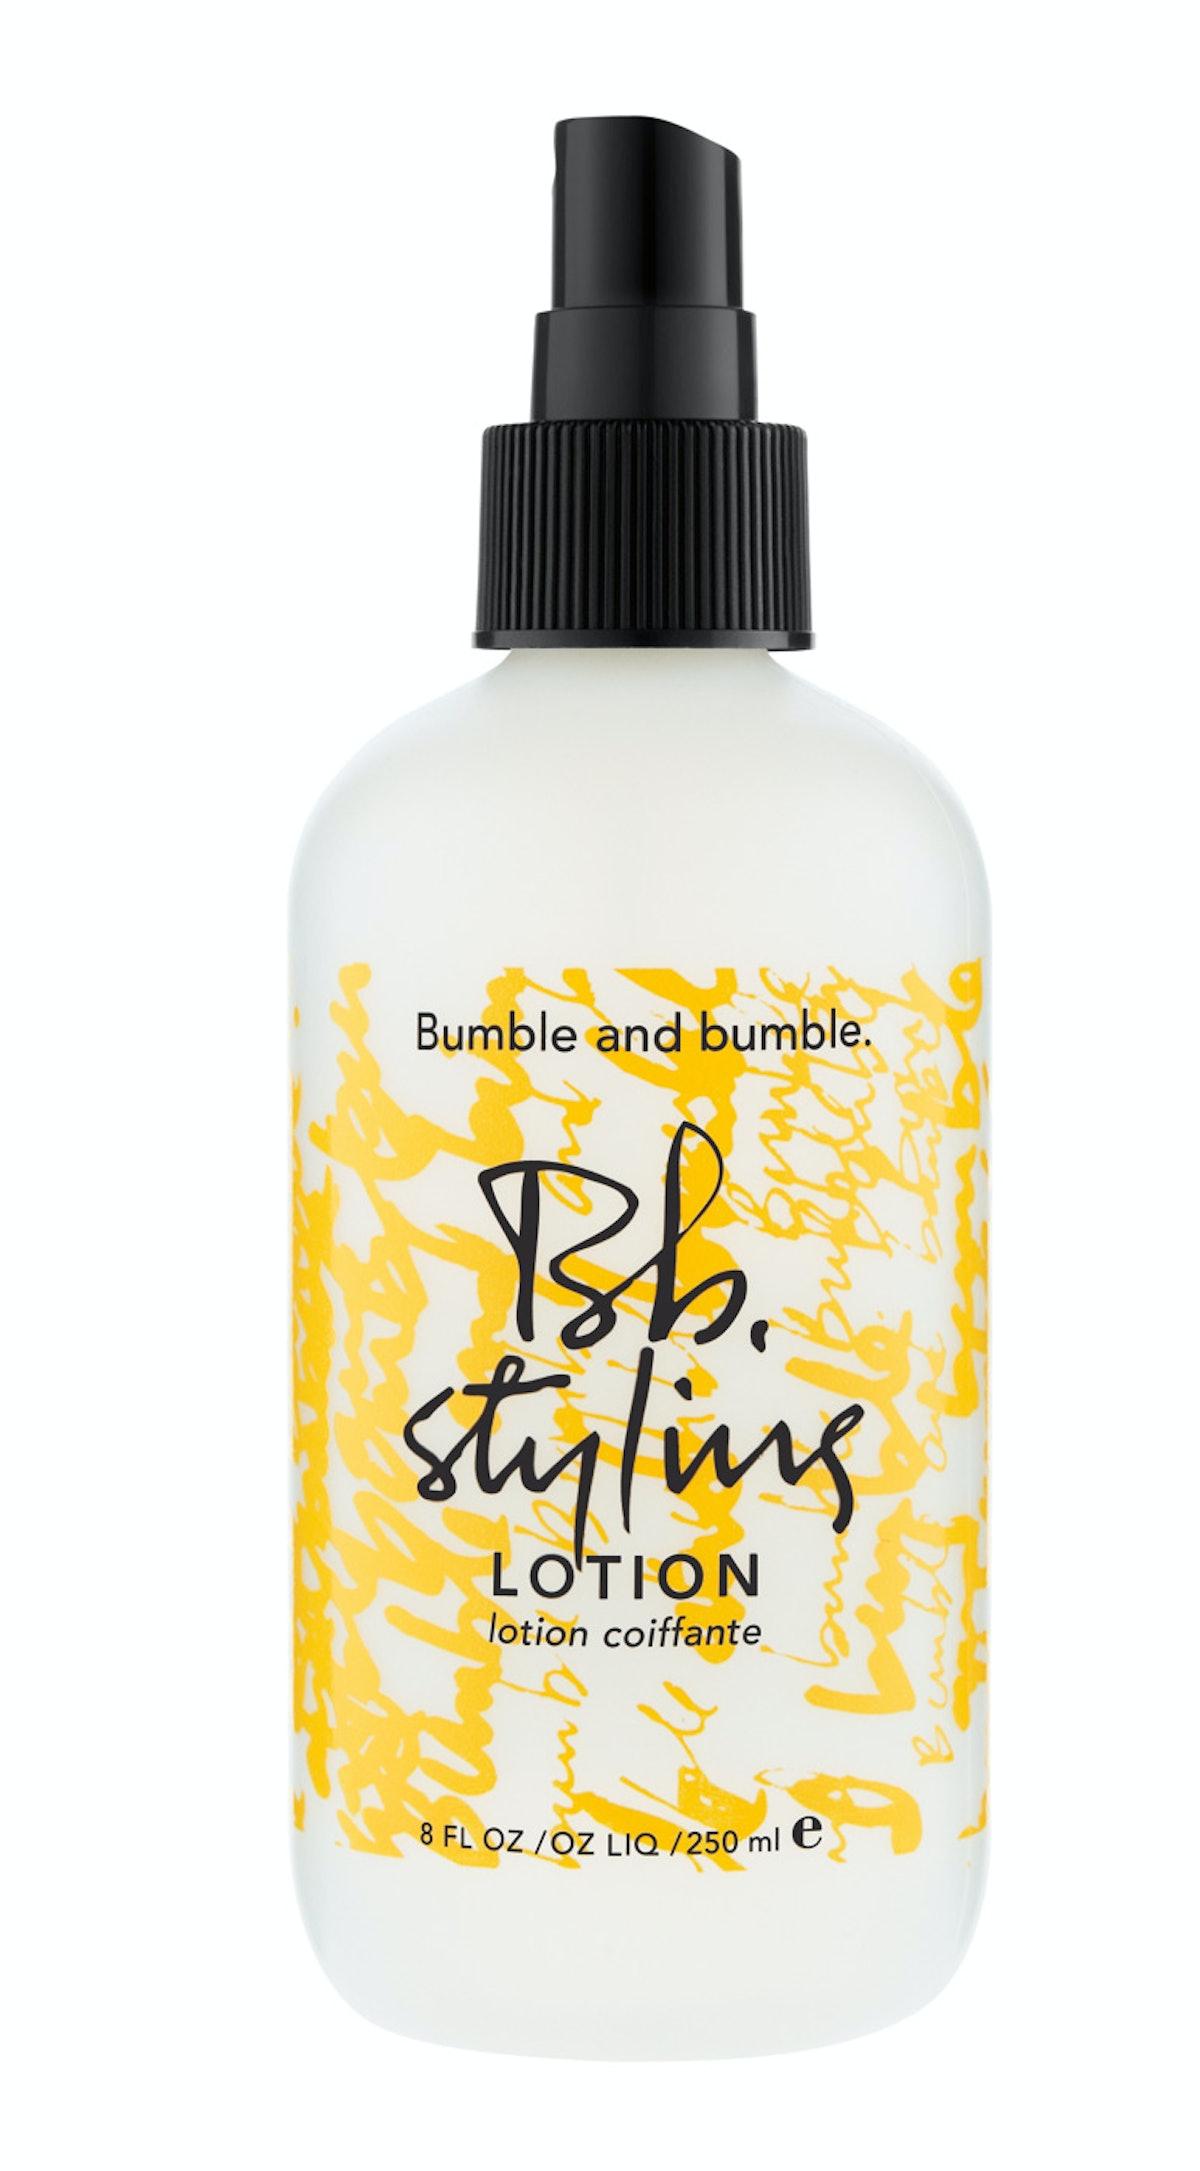 Bumble-Styling_Lotion_8oz_300dpi